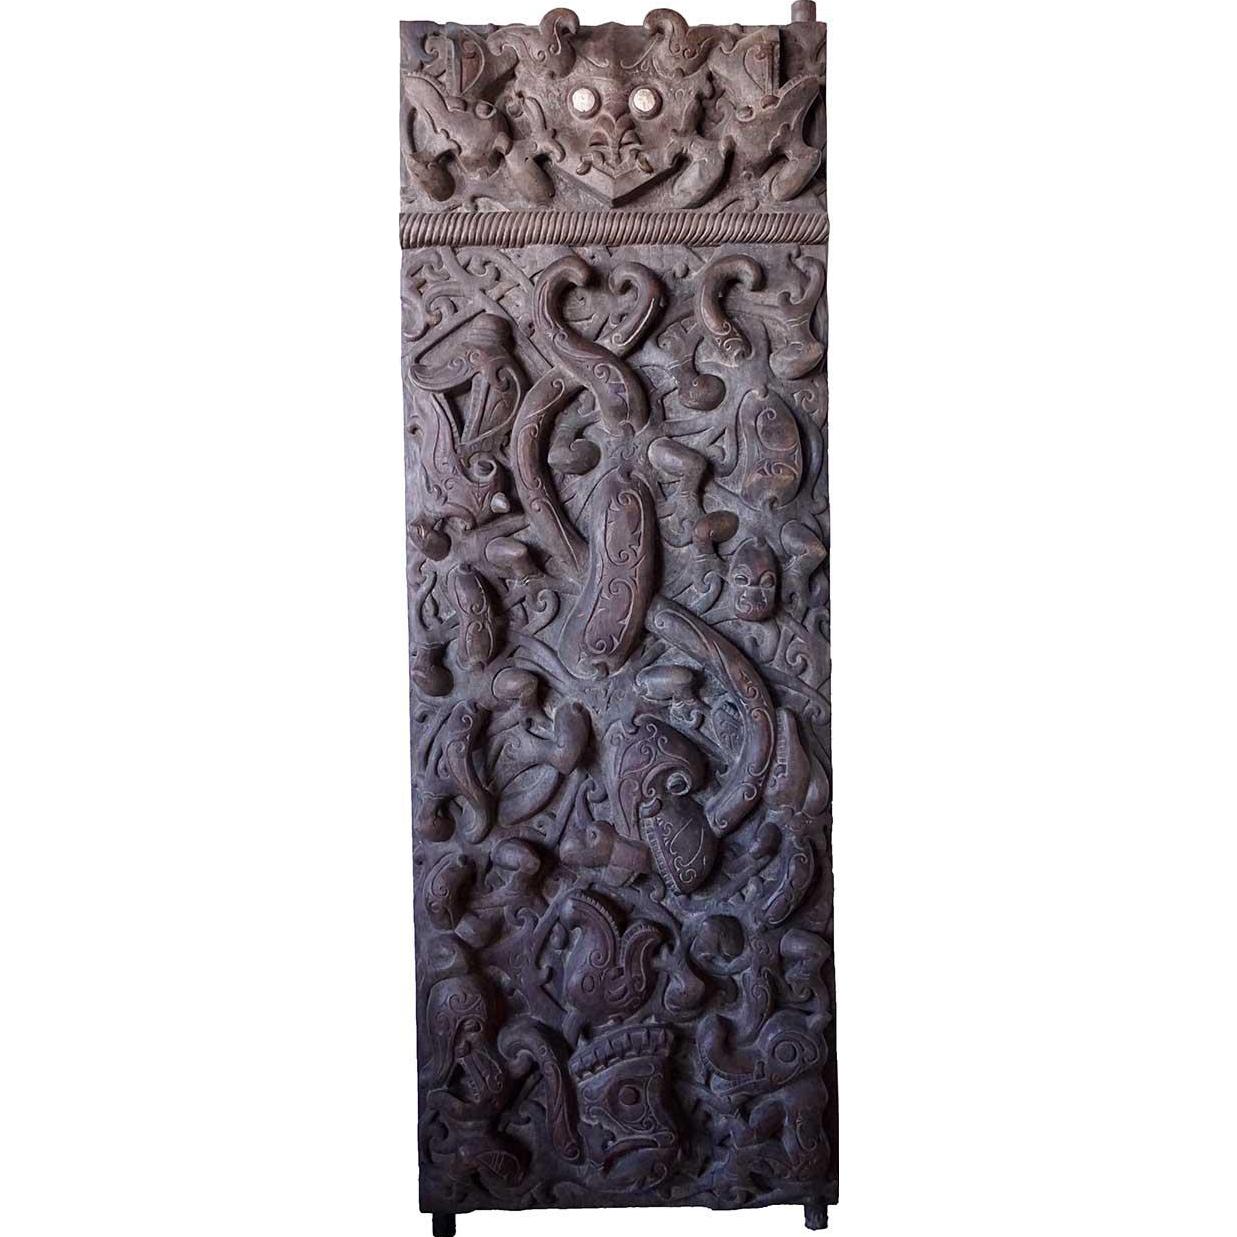 Rare Large Borneo Dayak Chief's Ironwood Single Door